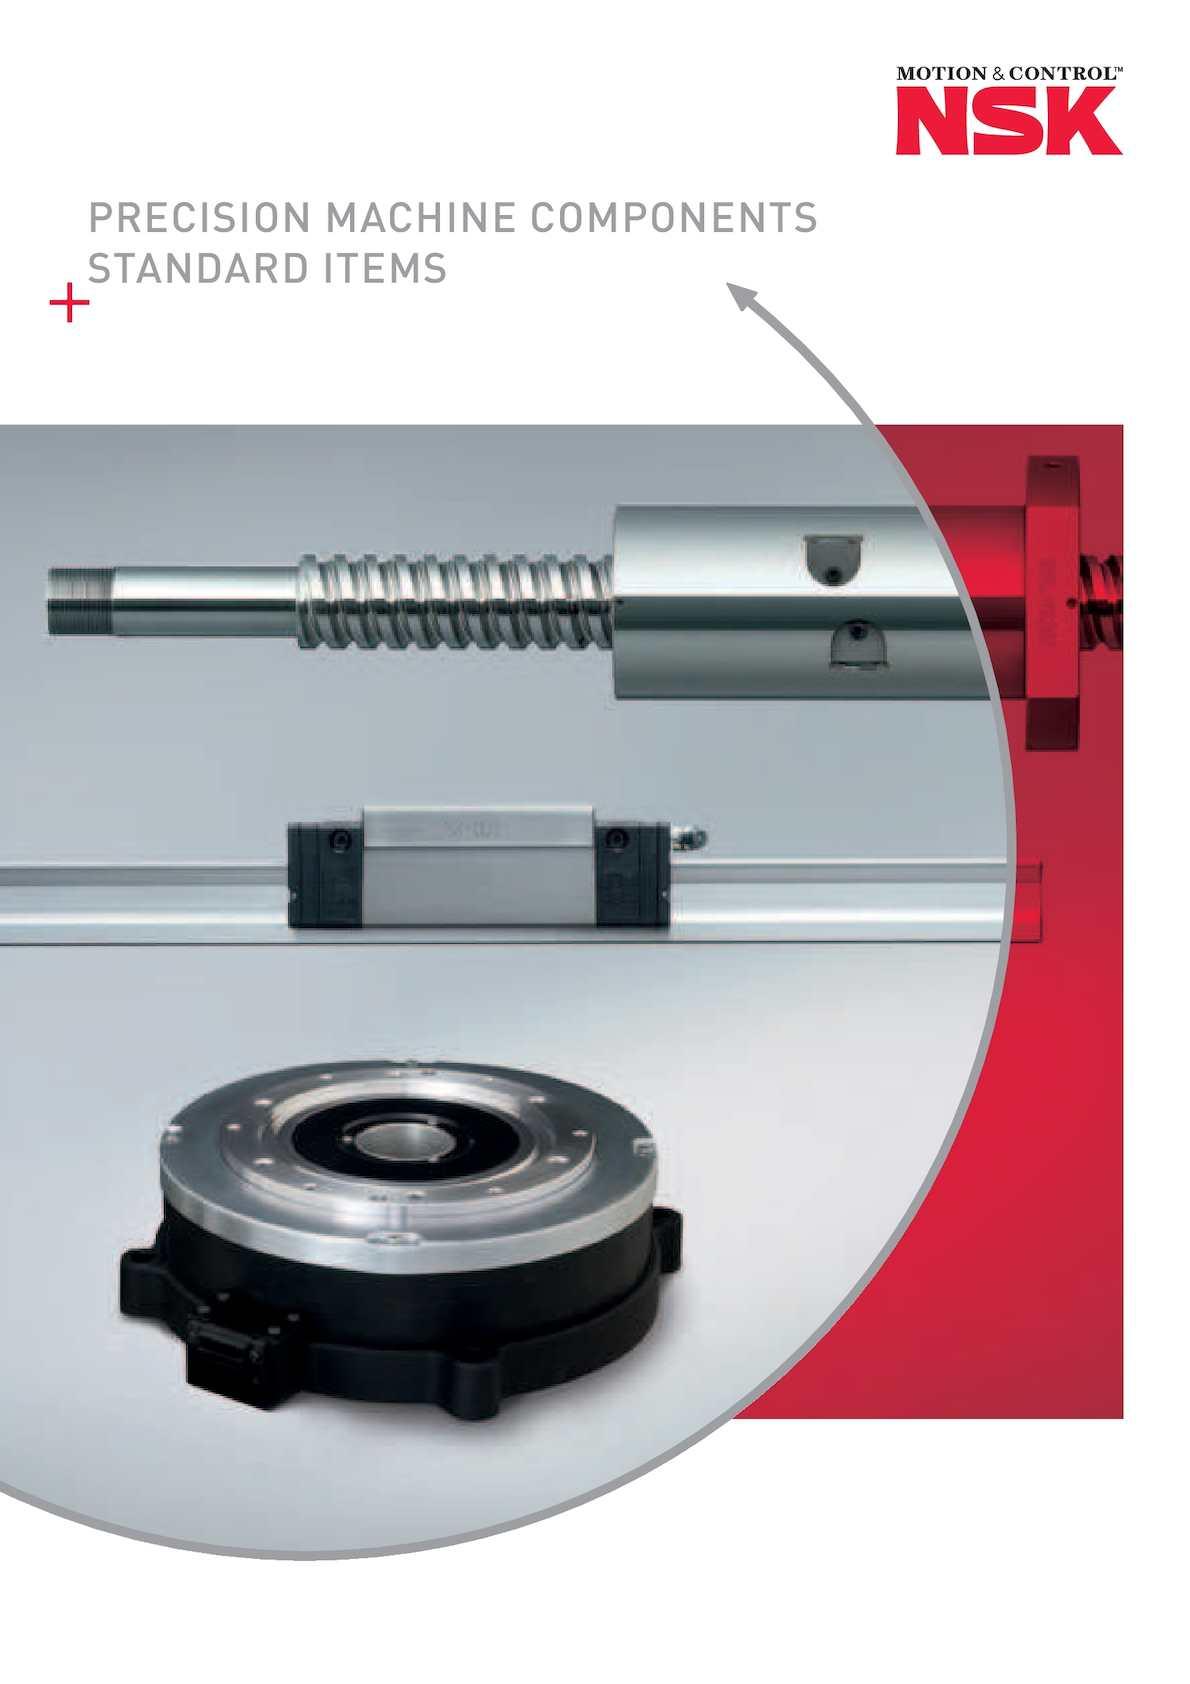 Pack of 250 Dia 3mm Diameter Chrome Steel Bearing Balls G25 Quality Small//Micro